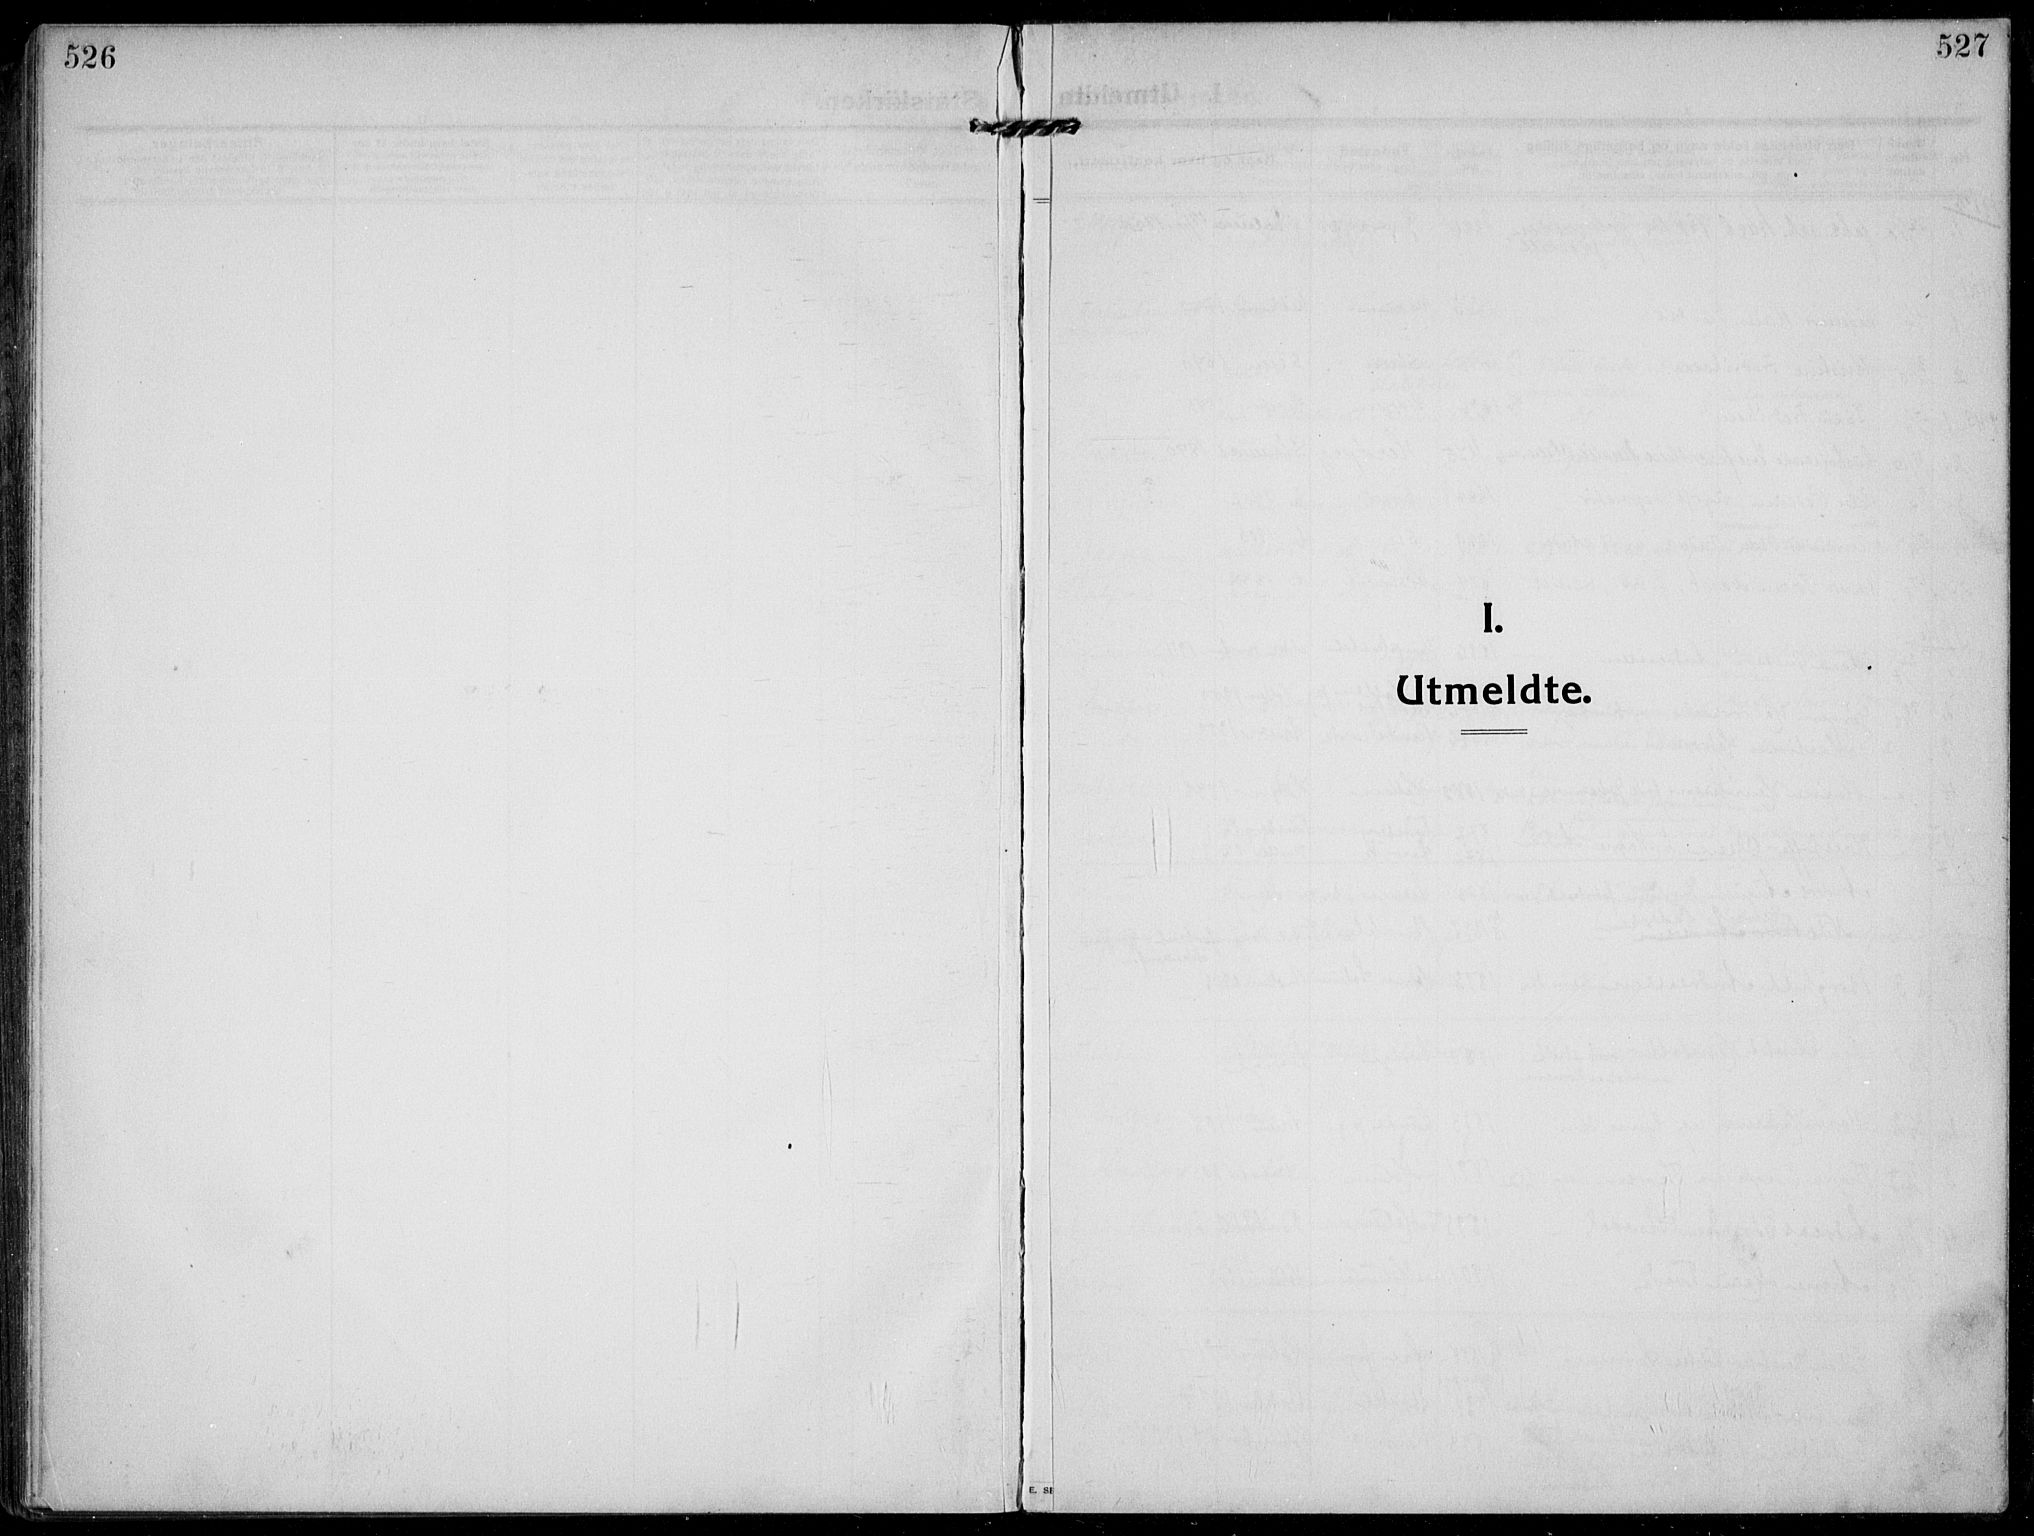 SAKO, Solum kirkebøker, F/Fb/L0004: Ministerialbok nr. II 4, 1913-1924, s. 526-527